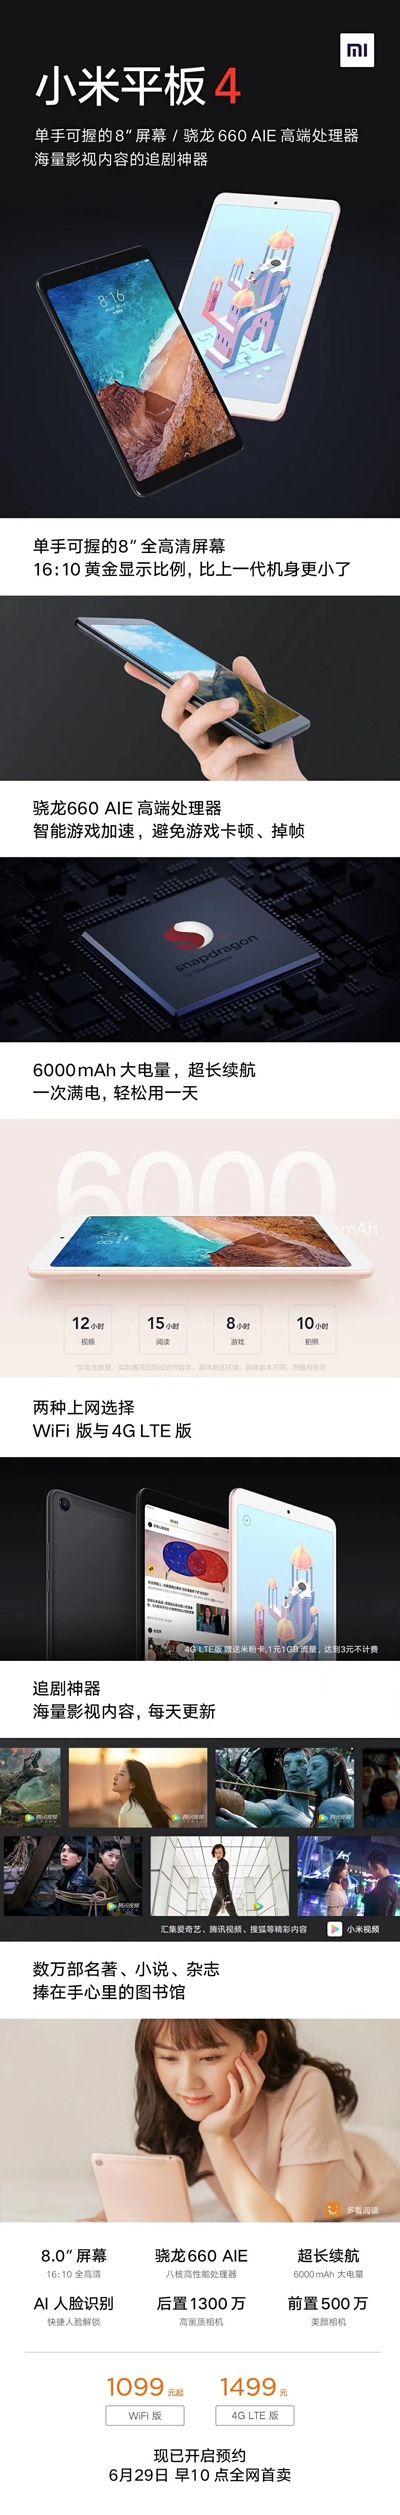 Анонс Xiaomi Mi Pad 4: Android-планшет на базе Snapdragon 660 AIE с Face Unlock стоимостью от $169 – фото 4